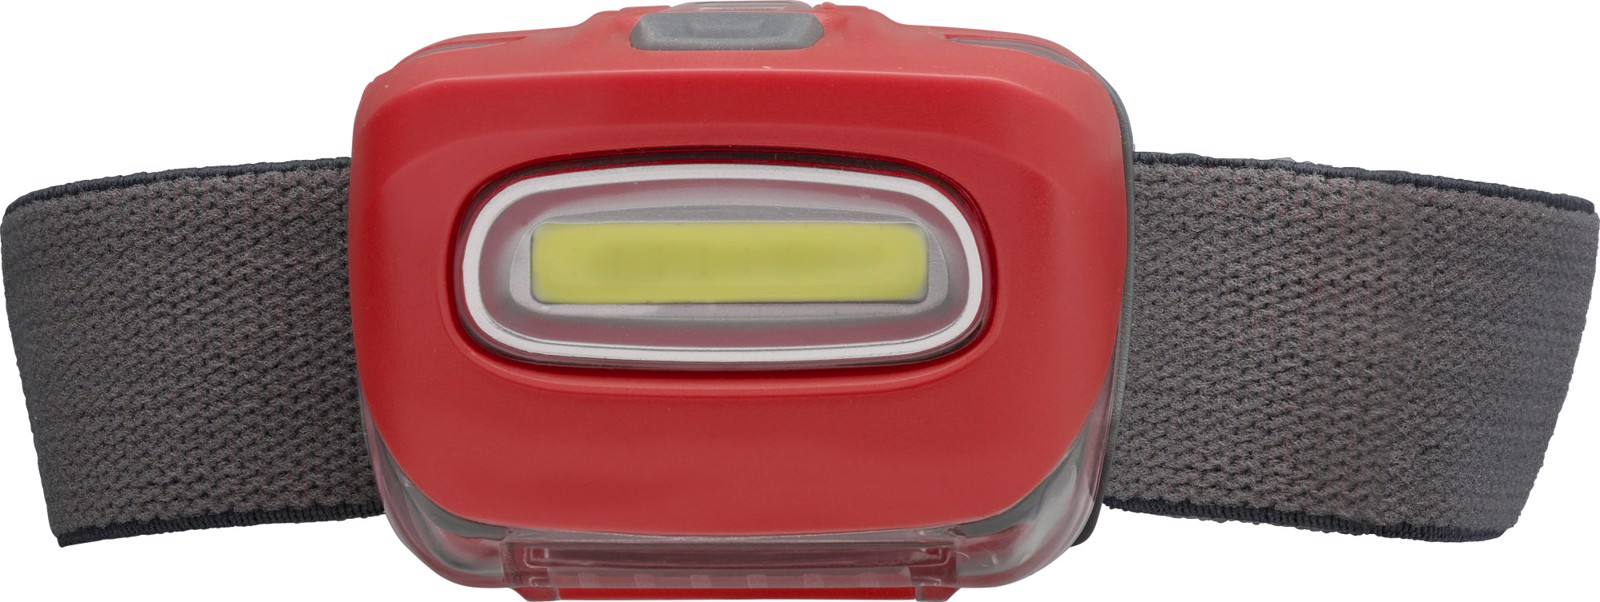 ABS head light - Red